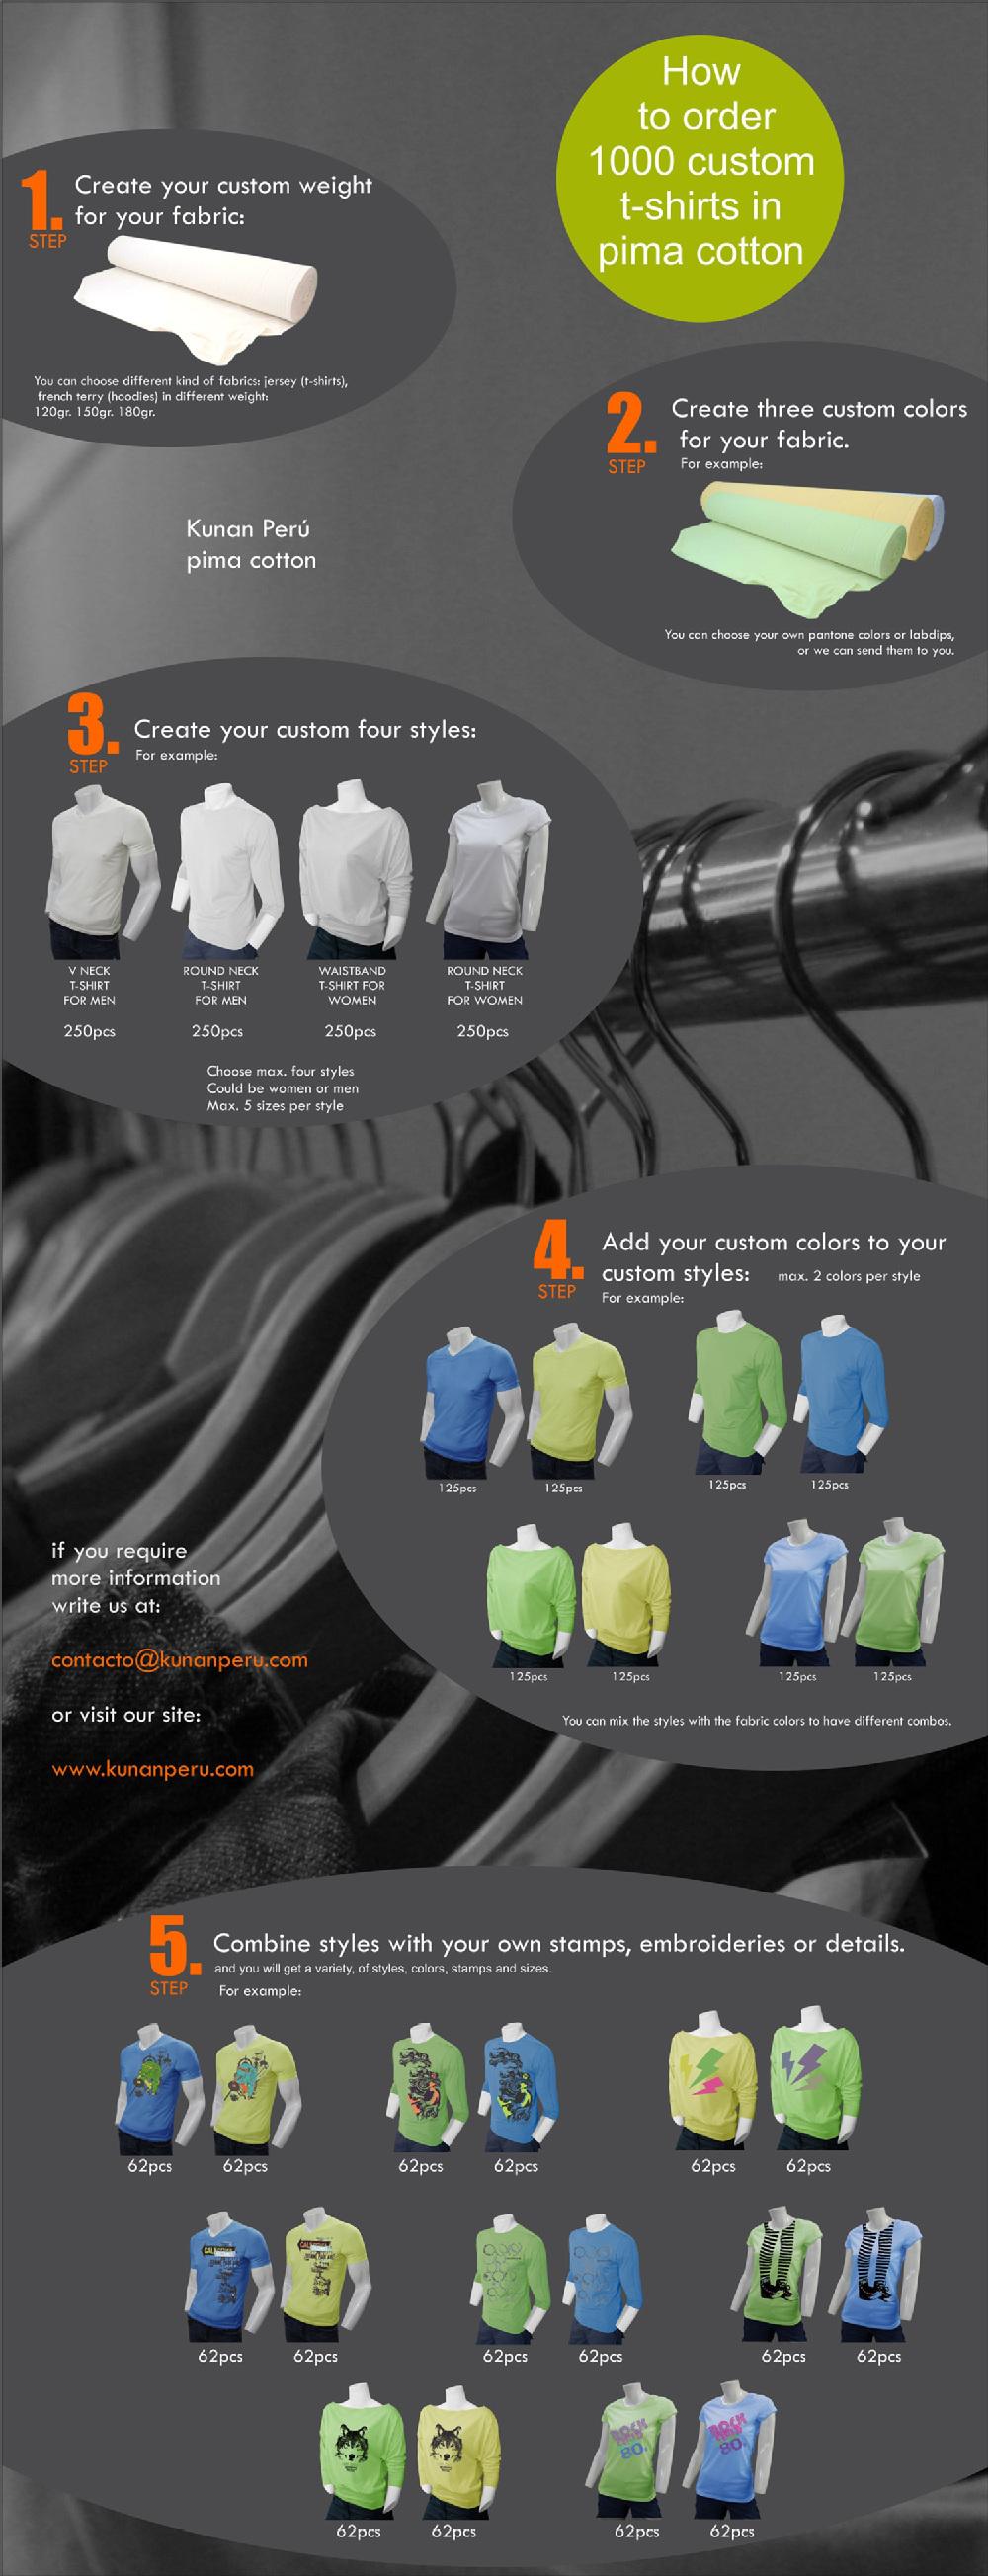 Design your own eco-friendly t-shirt - 100 Organic Eco Friendly Peru Pima Cotton 100 Certified Blank T Shirt